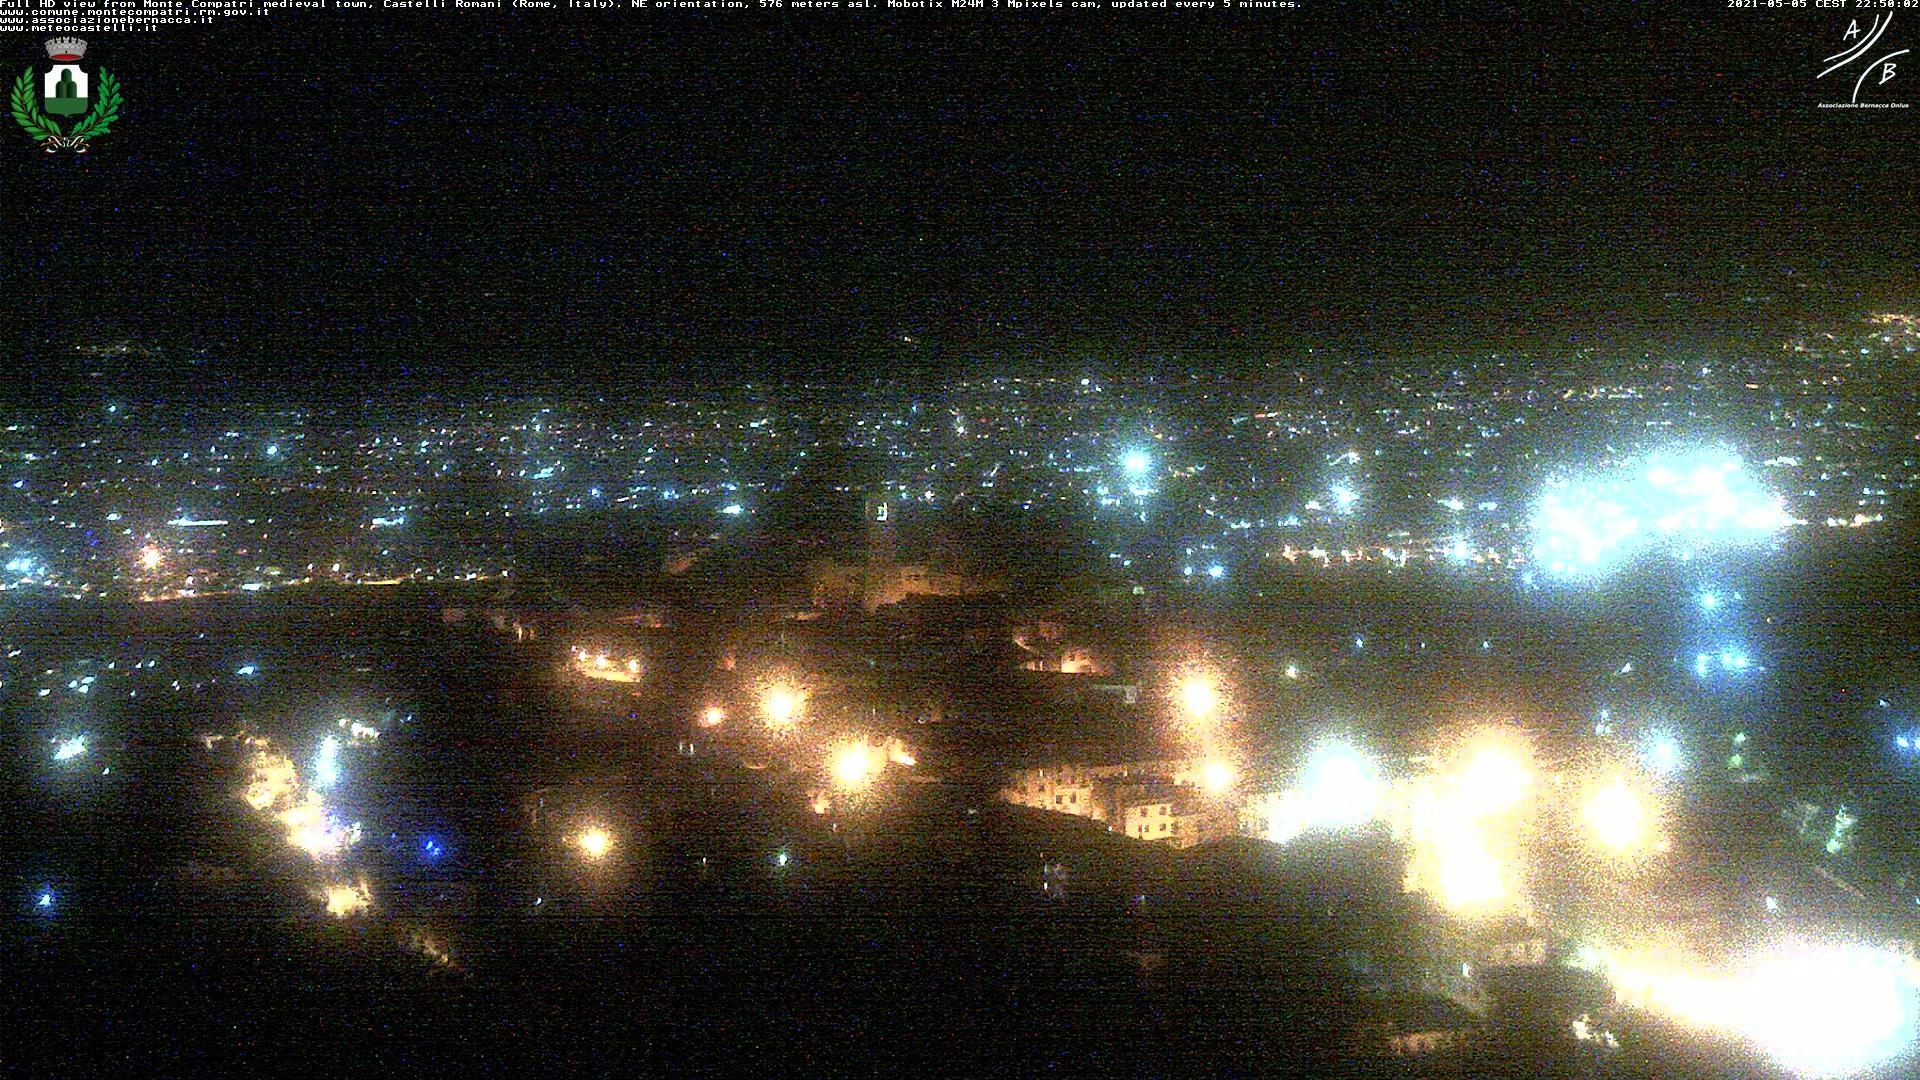 Webcam Monte Compatri: Medieval town